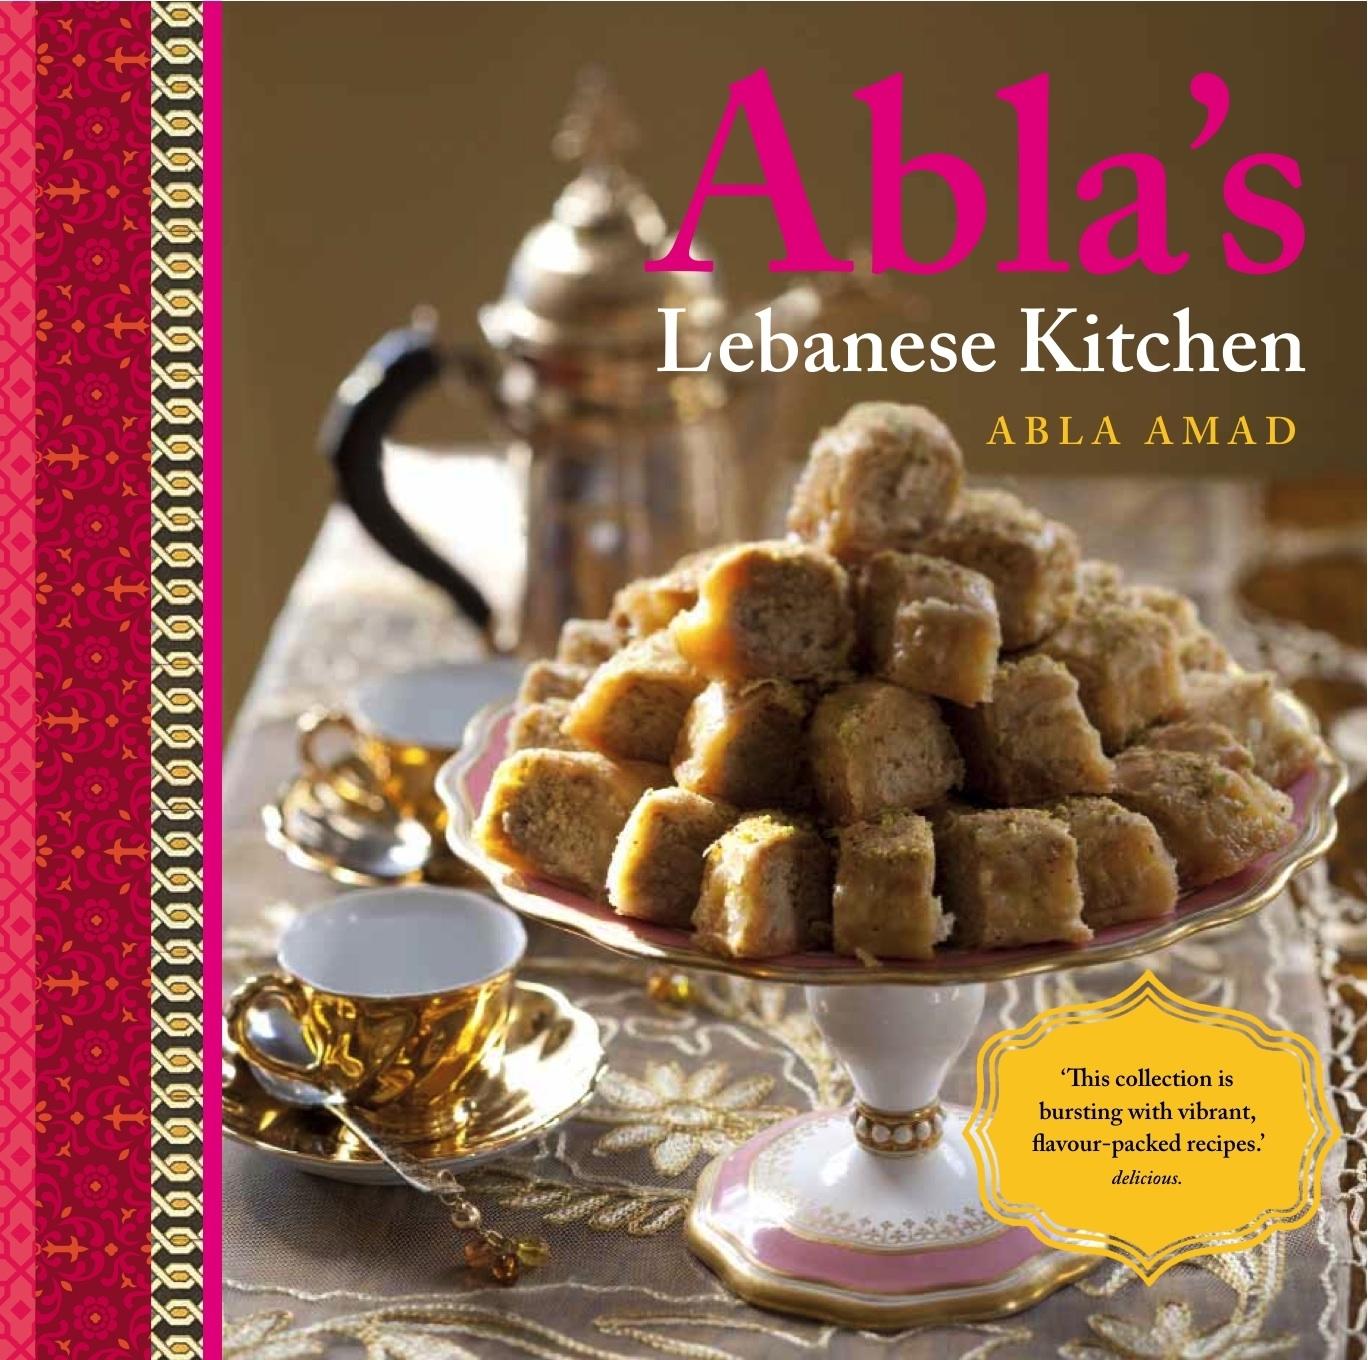 Abla's Lebanese Kitchen